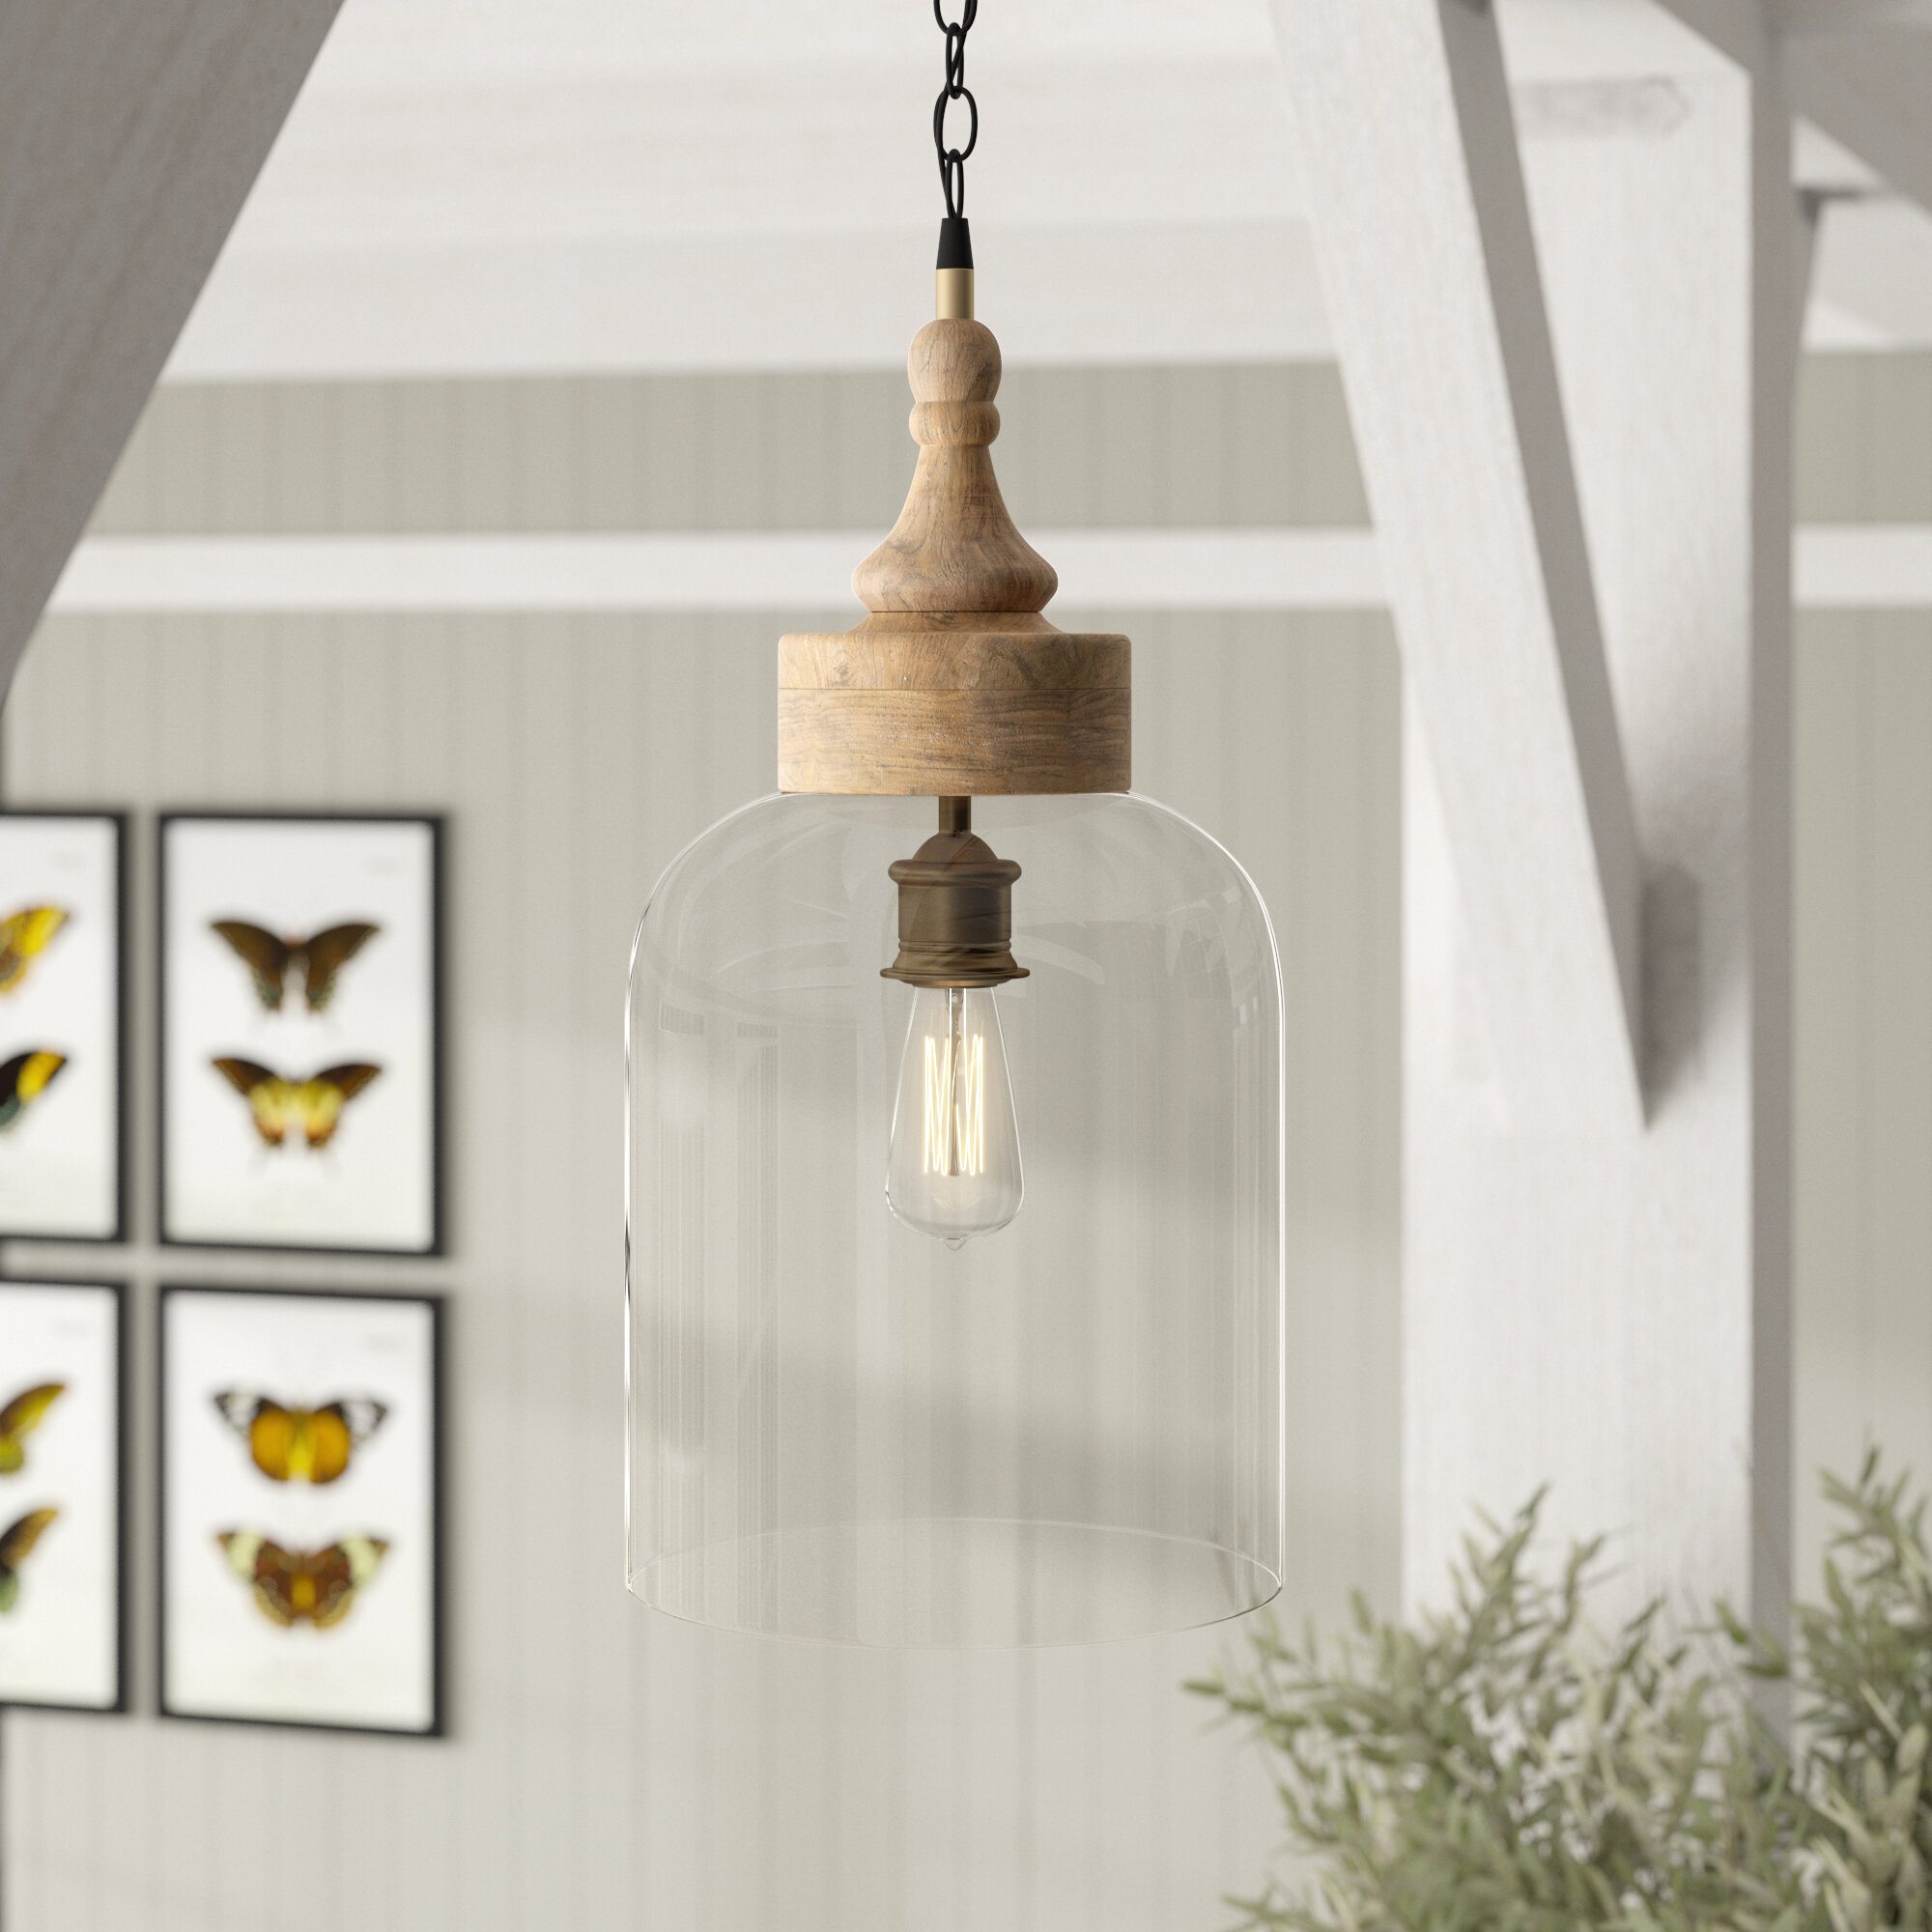 Olivo 1 Light Bell Pendant In Moyer 1 Light Single Cylinder Pendants (View 20 of 30)